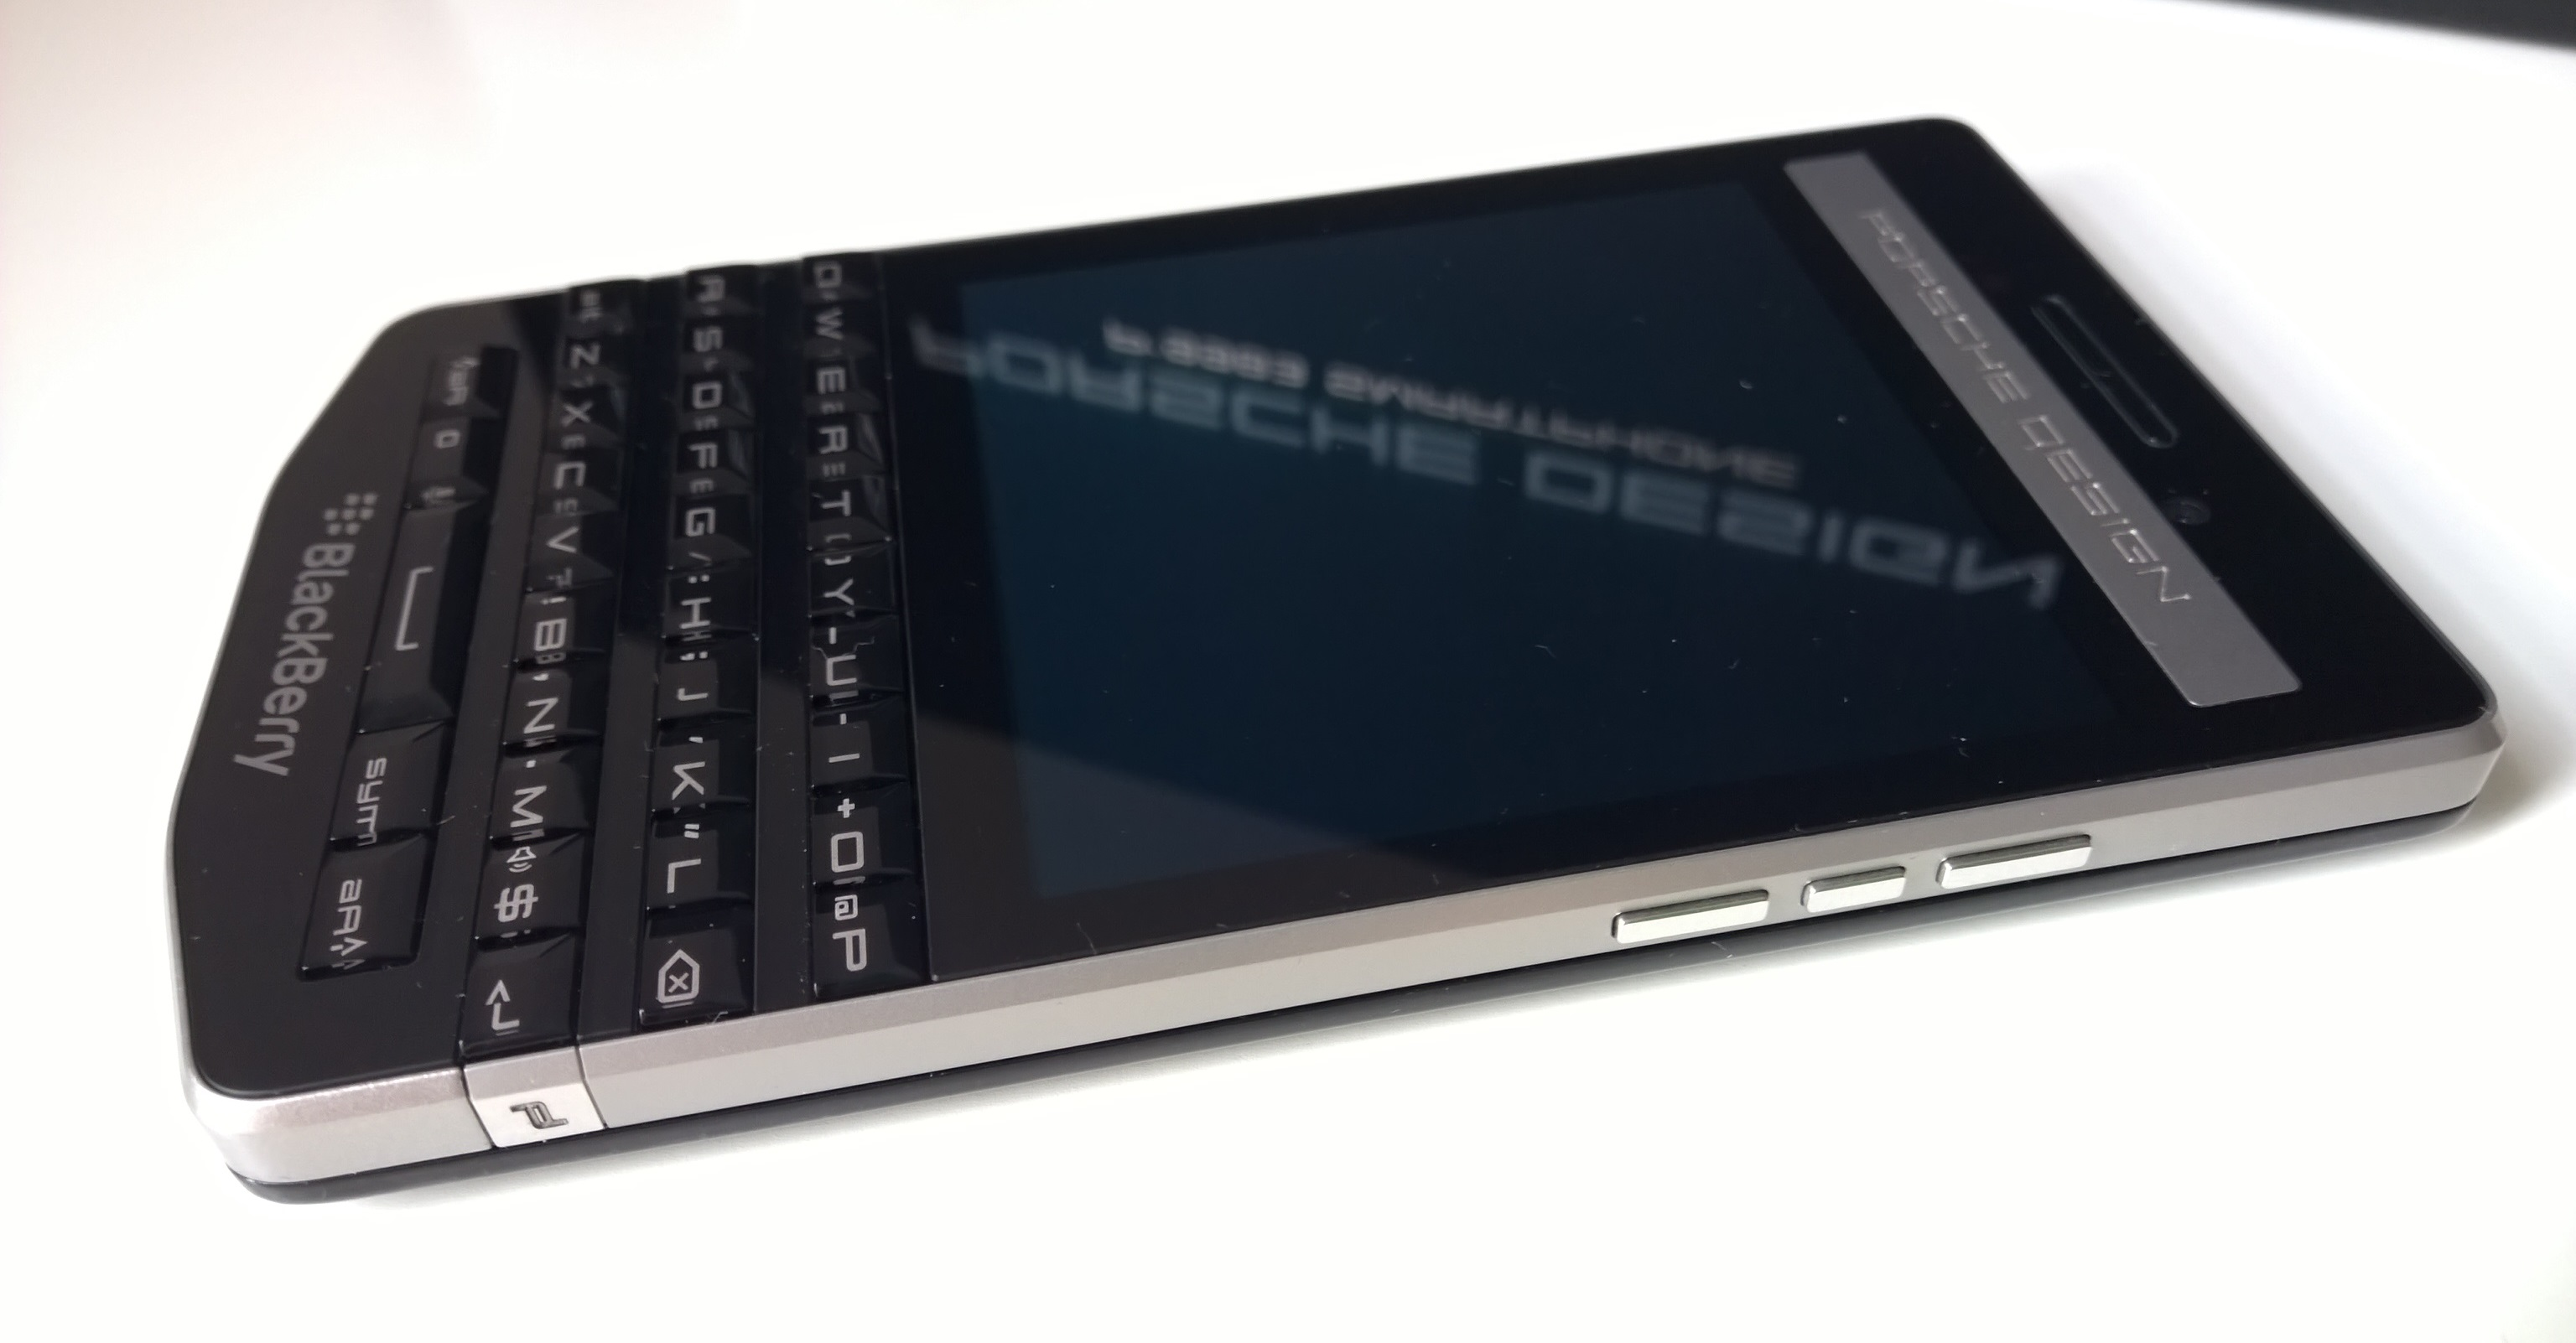 qwerty je zp tky blackberry ukazuje luxusn porsche. Black Bedroom Furniture Sets. Home Design Ideas